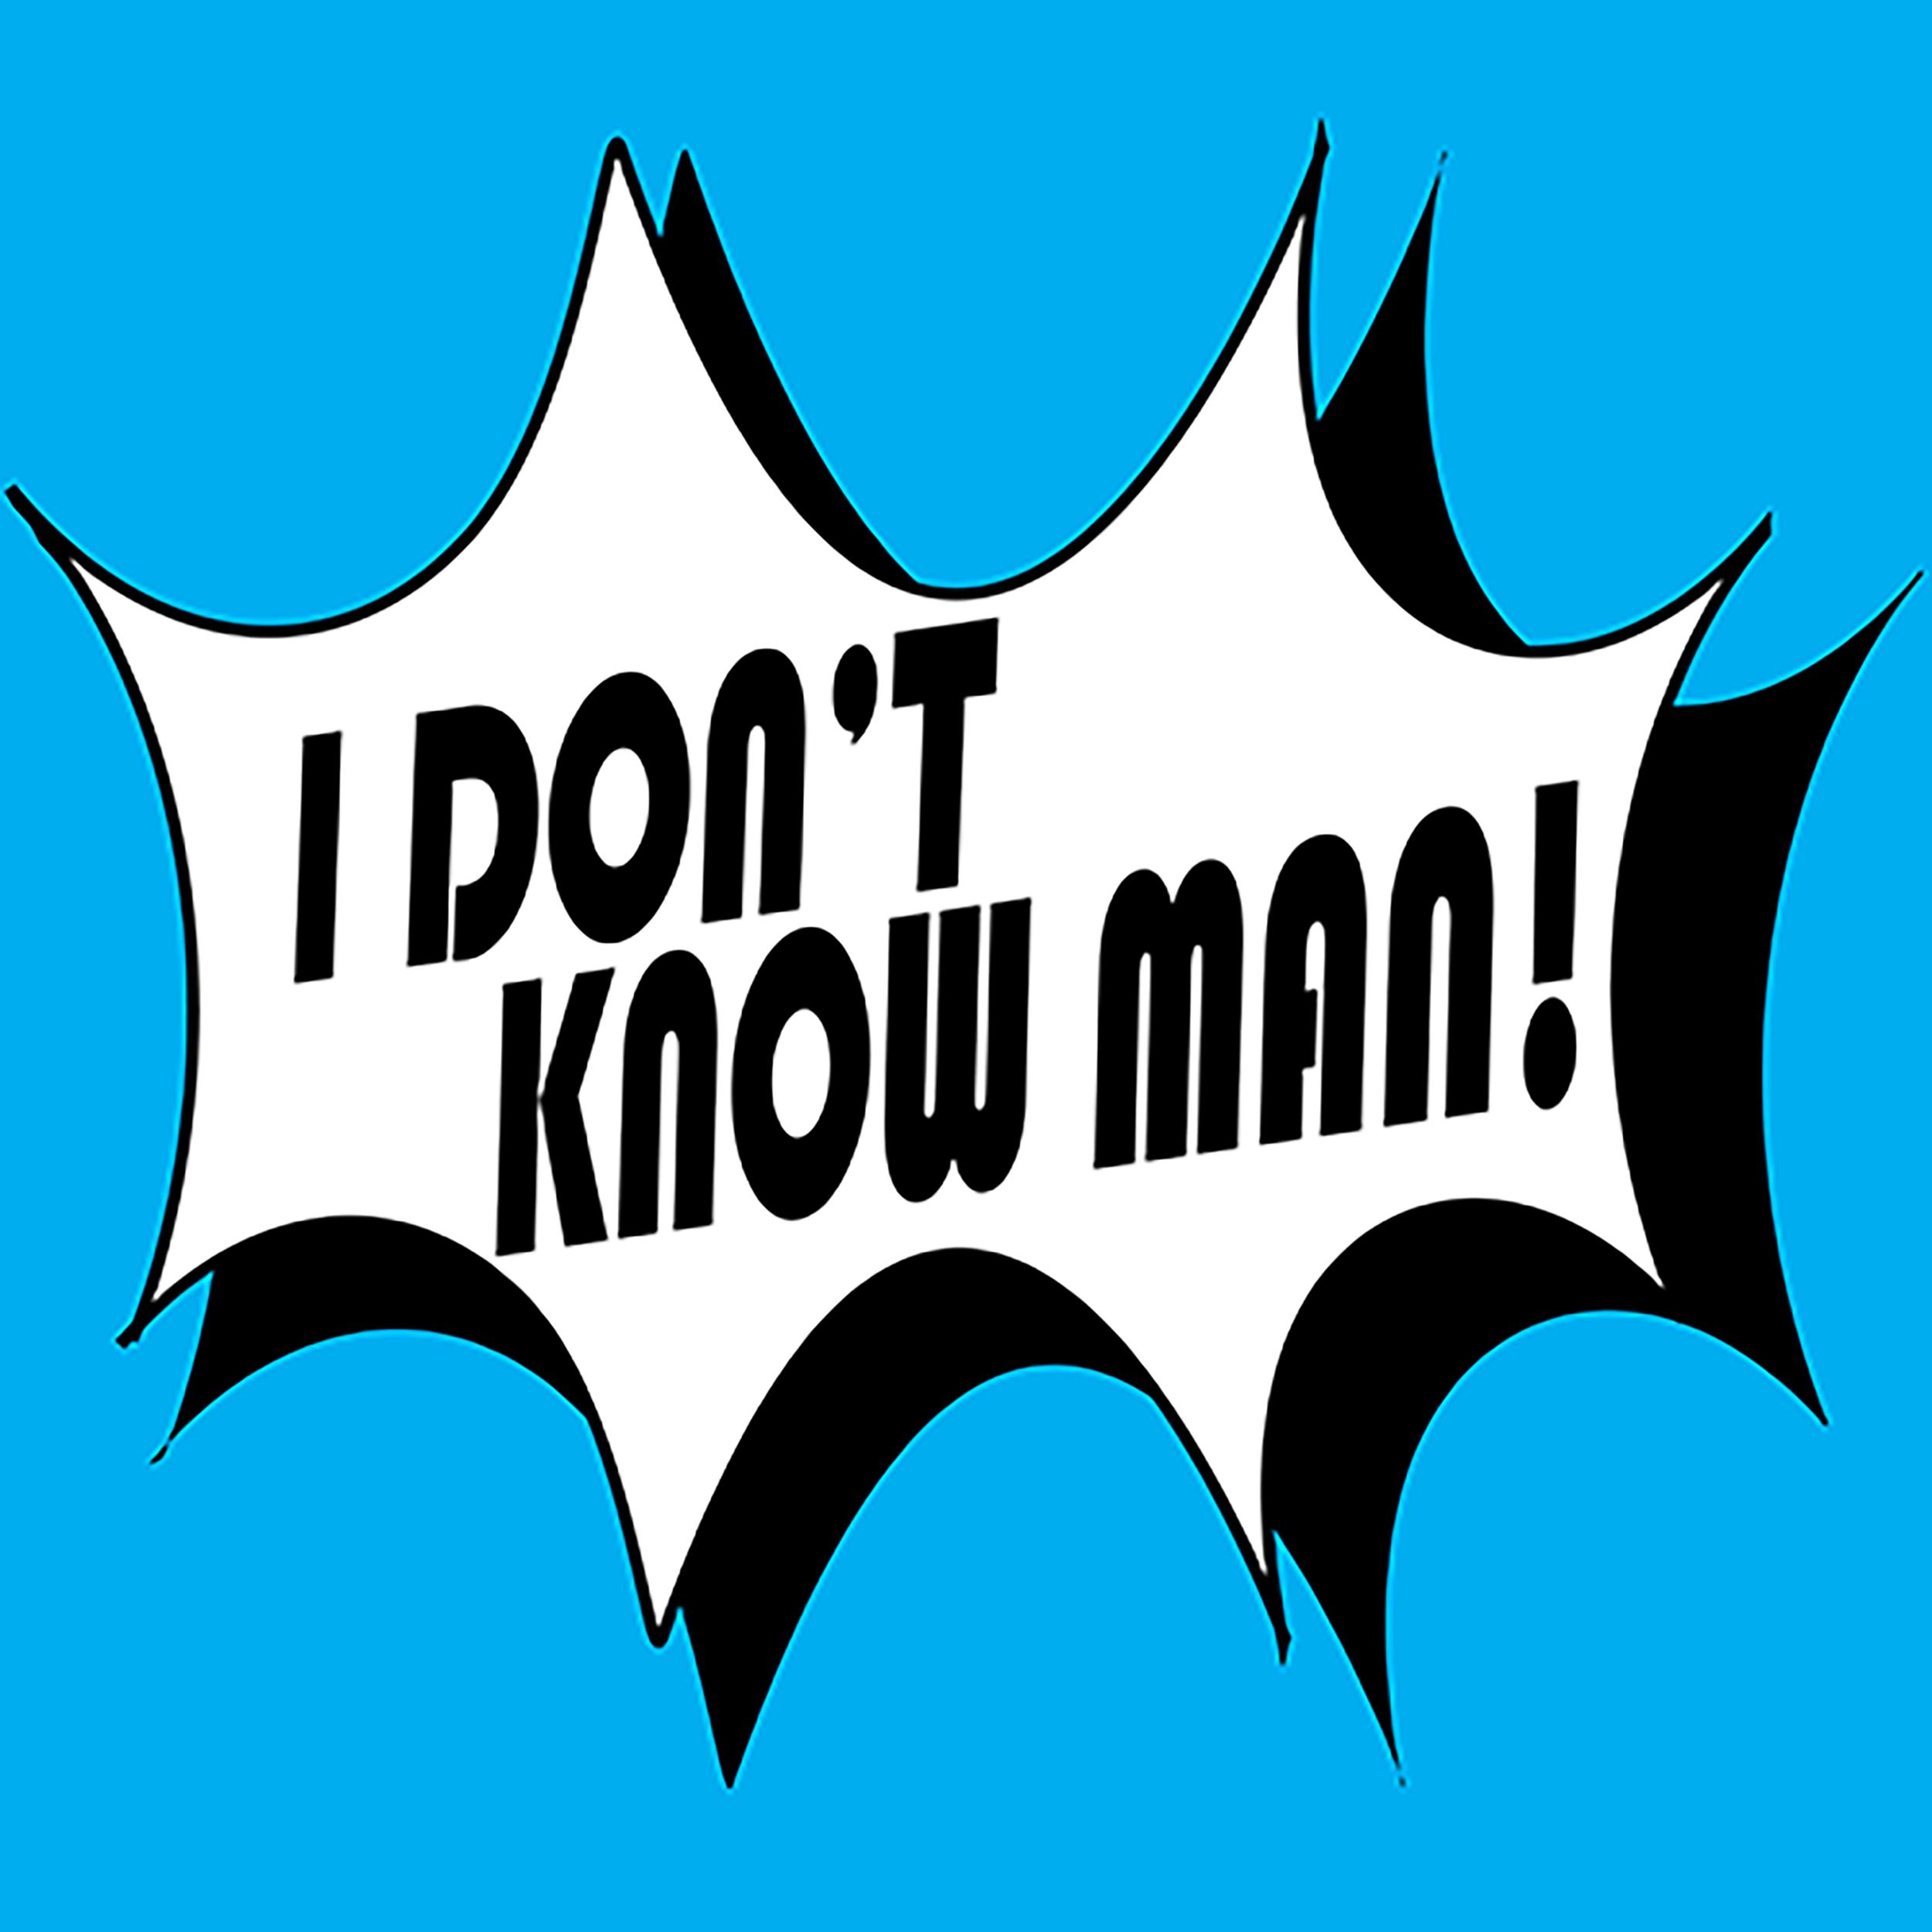 idkm logo 3_3000.png